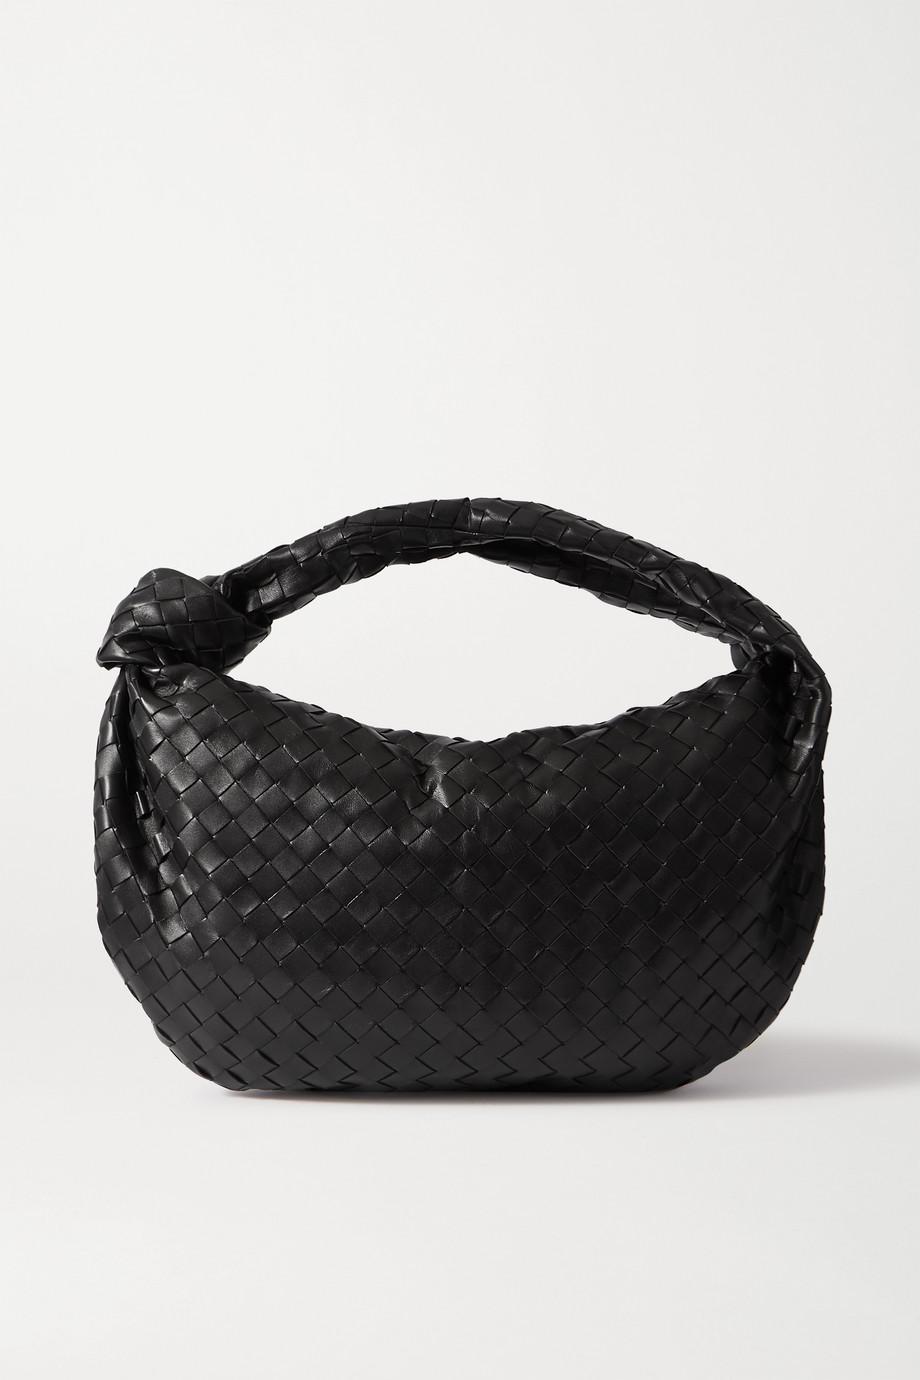 Bottega Veneta Sac à main en cuir intrecciato à nœud Jodie Medium